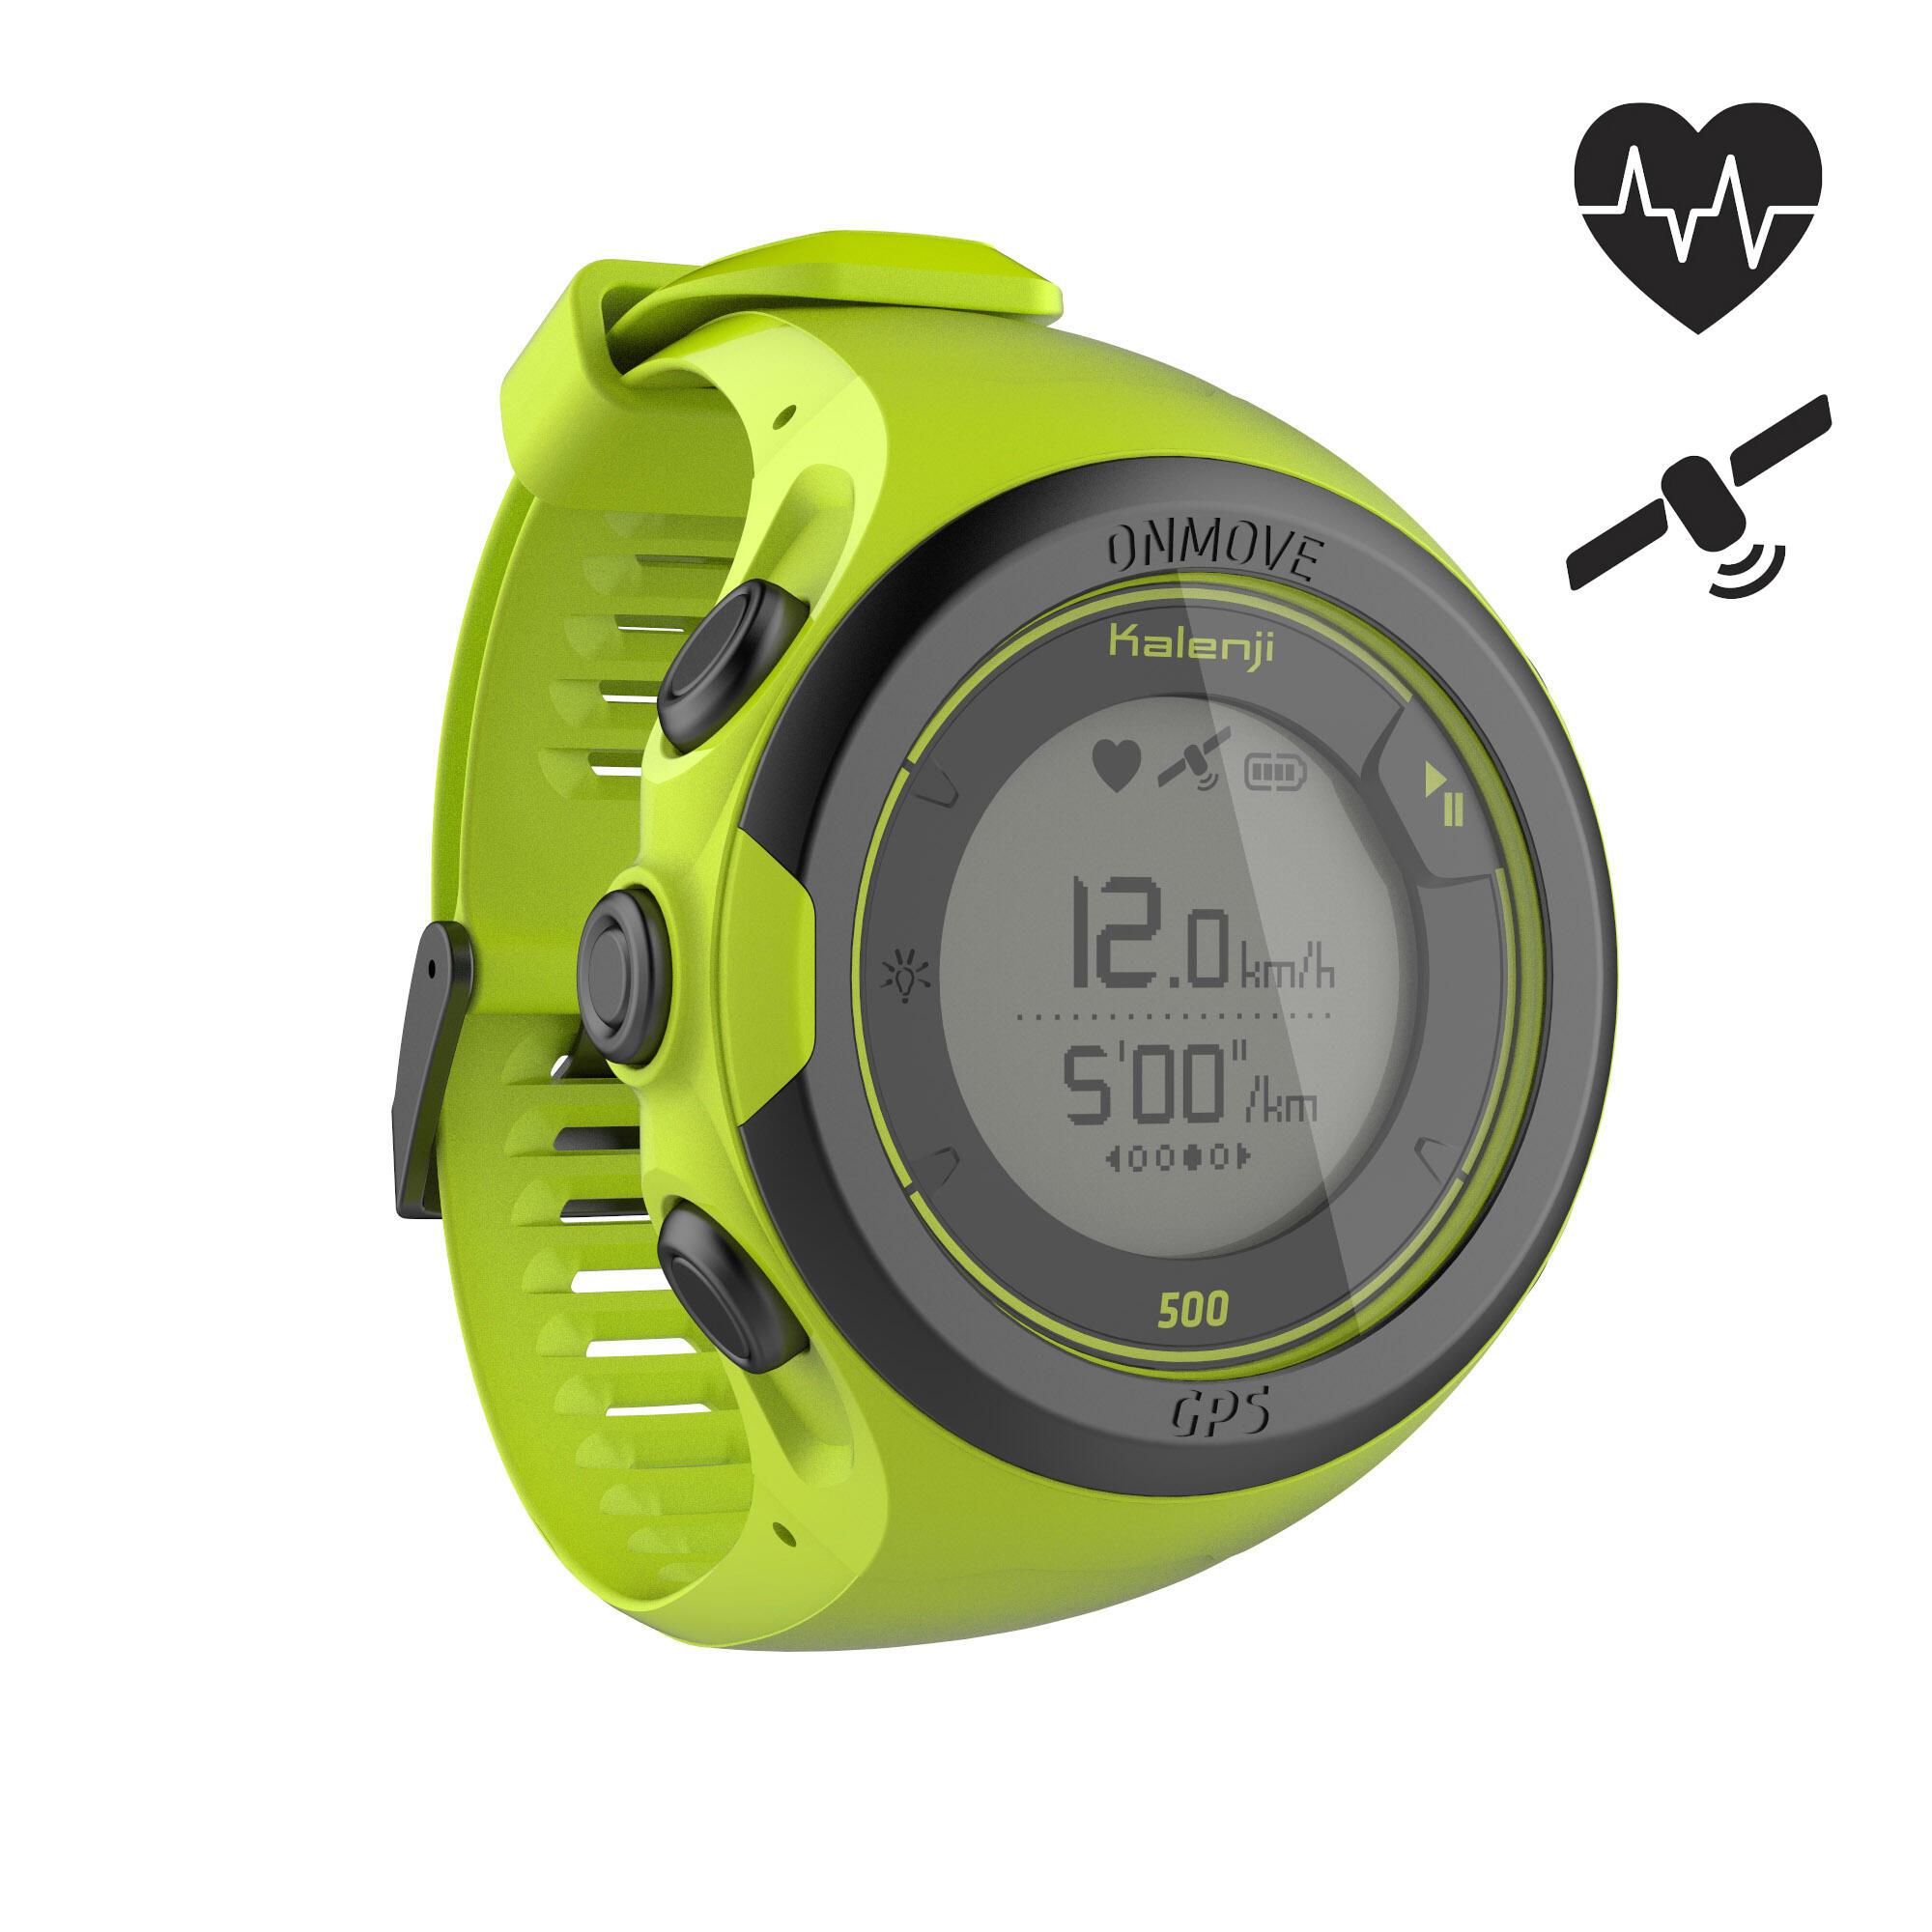 Montre de course à pied GPS cardio au poignet ONMOVE 500 jaune